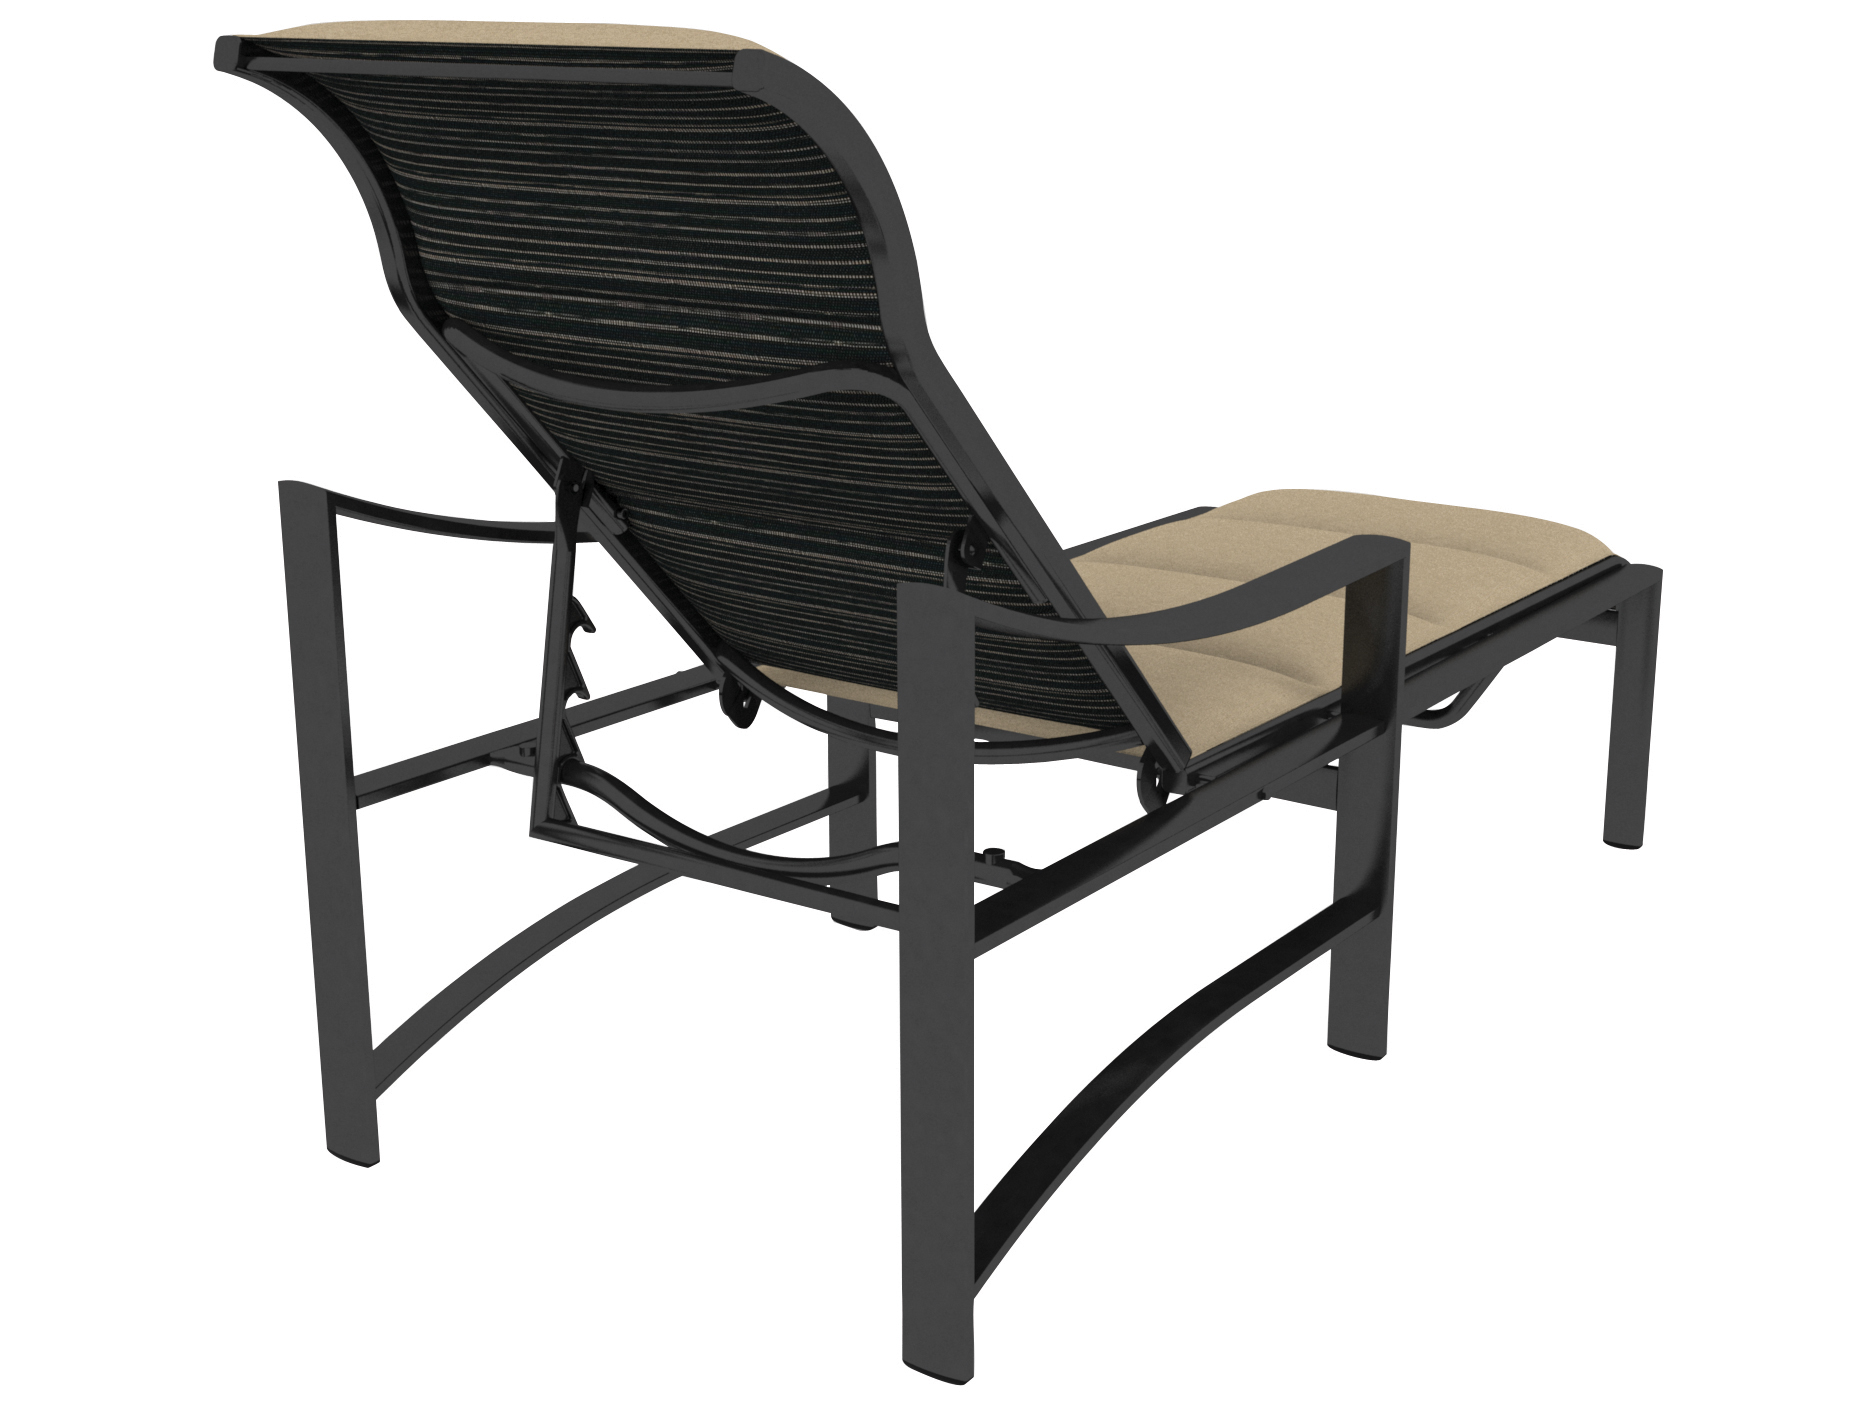 Tropitone kenzo padded sling aluminum chaise lounge for Aluminum sling chaise lounge